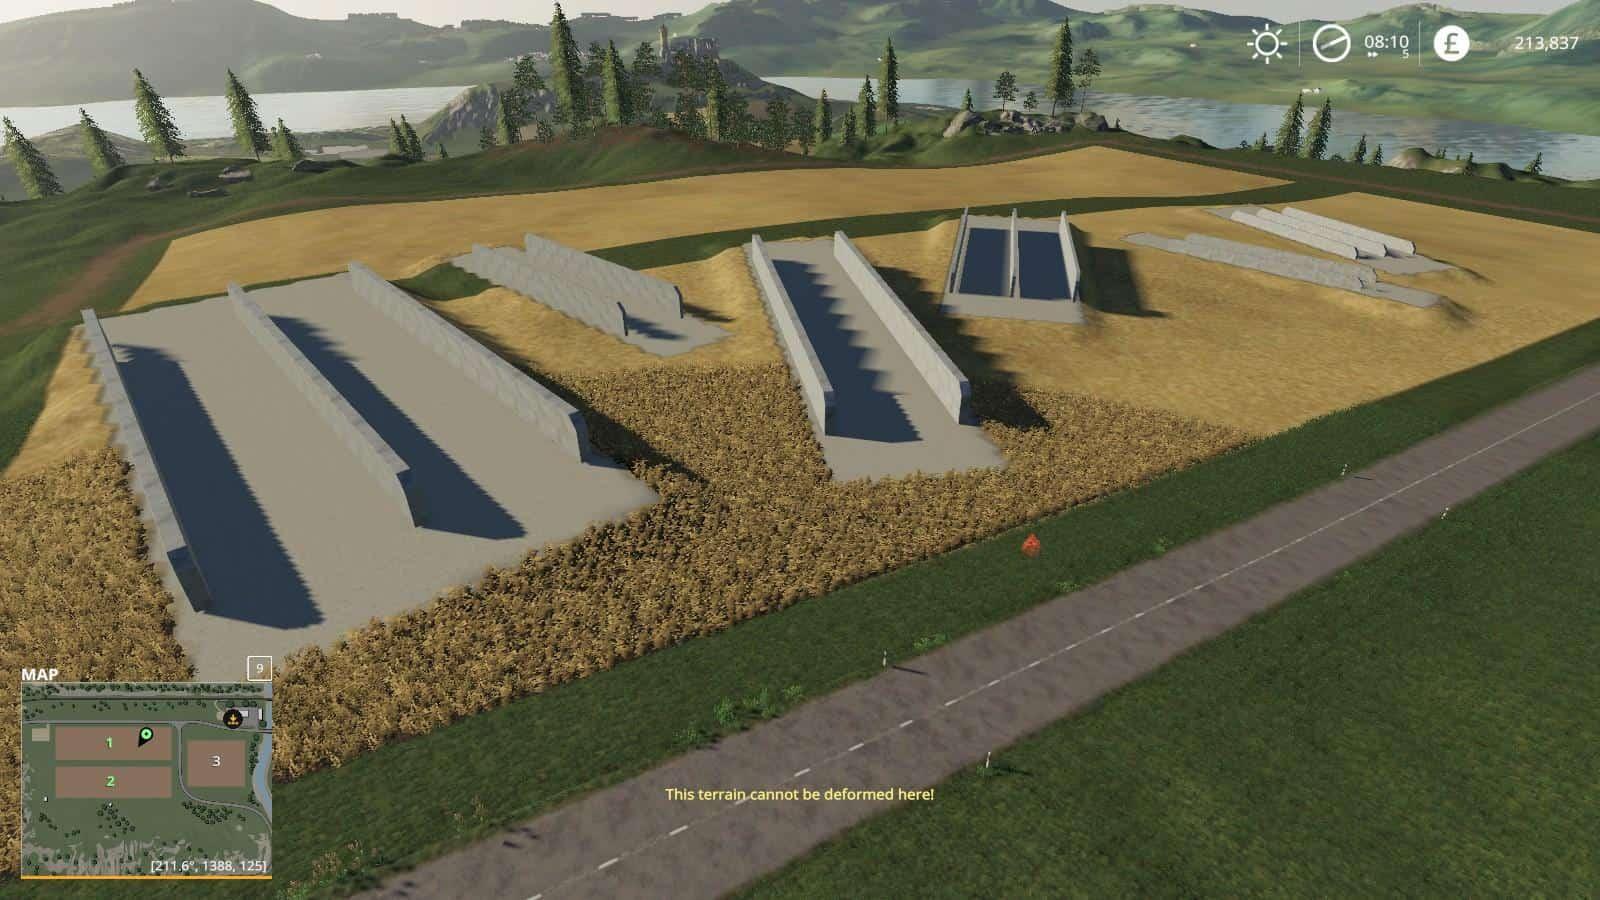 Bunker Silos 360 v1 0 0 0 Mod - Farming Simulator 19 Mod / FS19